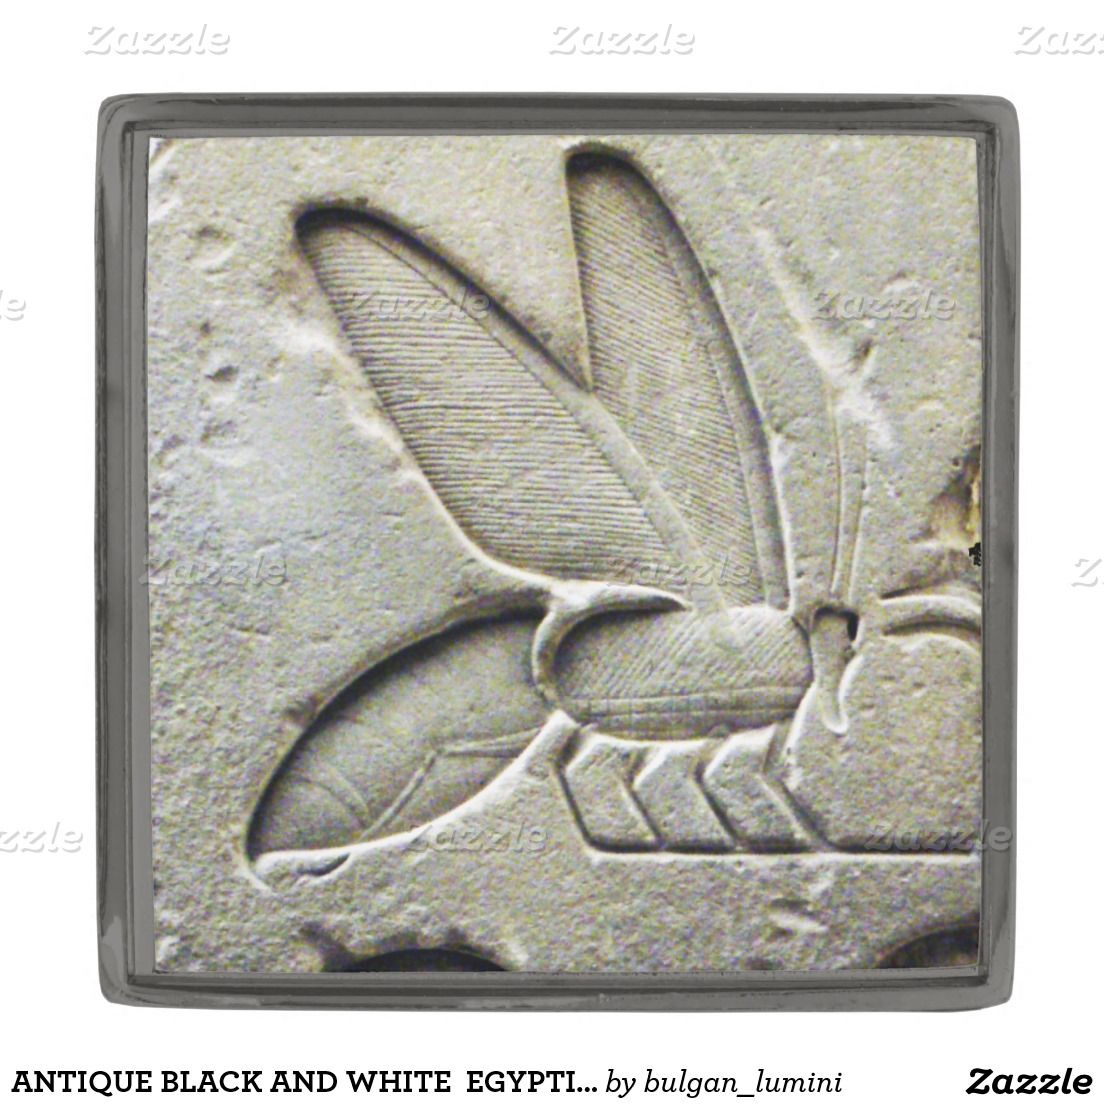 ANTIQUE BLACK AND WHITE  EGYPTIAN HONEY BEE GUNMETAL FINISH LAPEL PIN